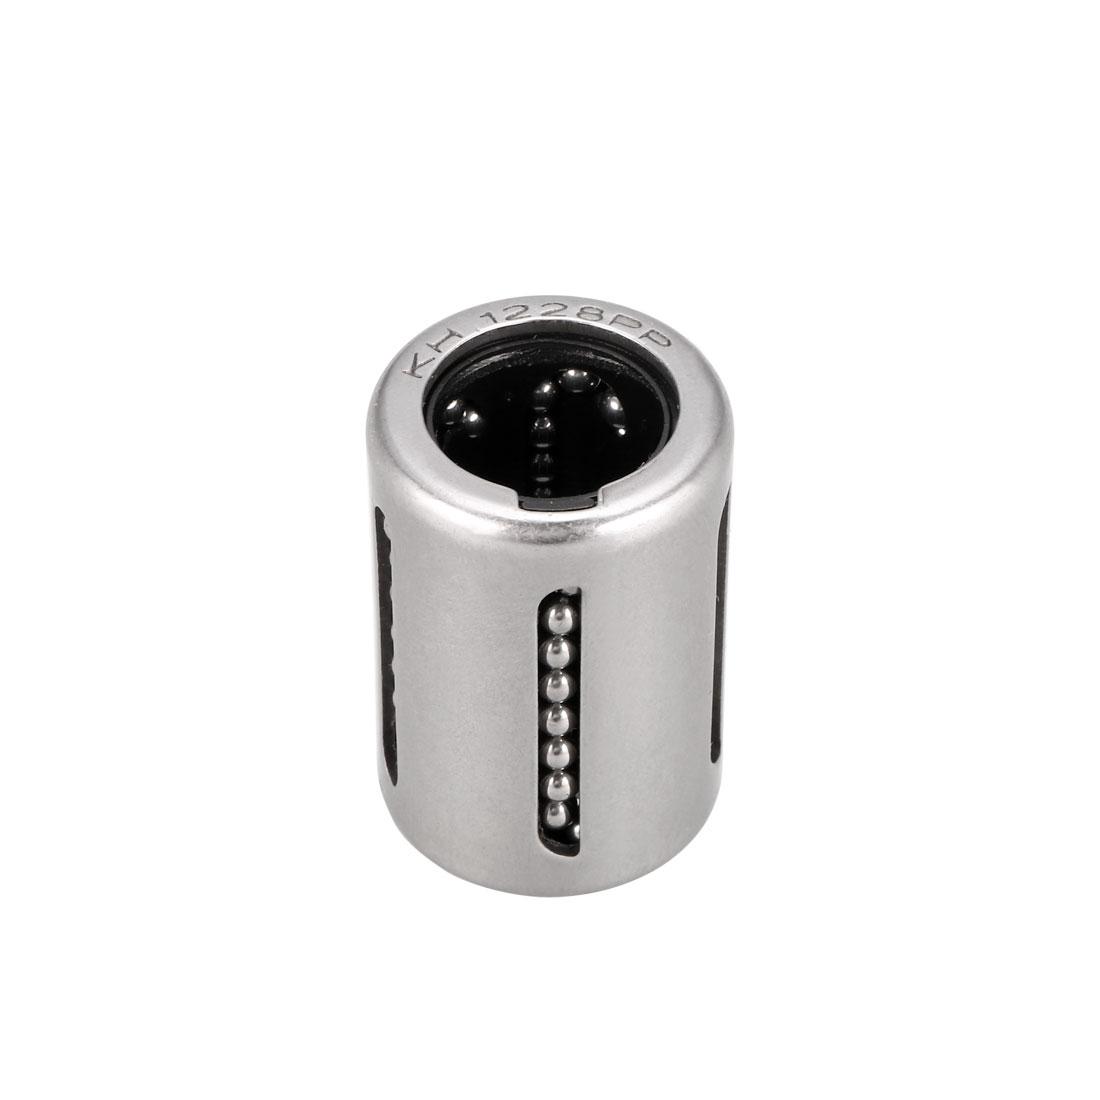 KH1228PP 12mm Shaft Dia 12mm x 19mm x 28mm Linear Motion Ball Bearing